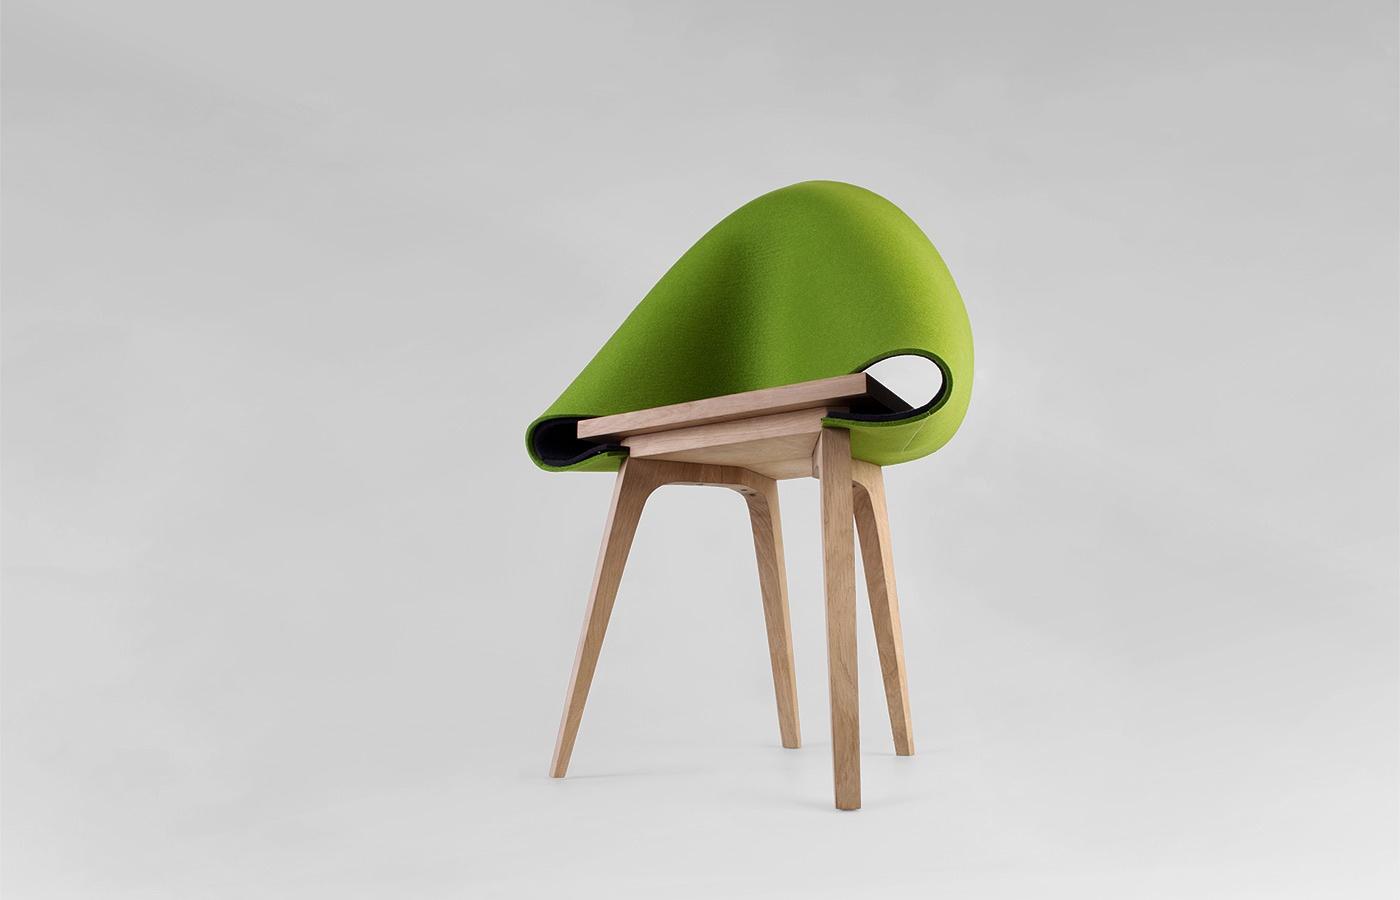 emilia-luchts-shape-shifting-nuno-chair-2